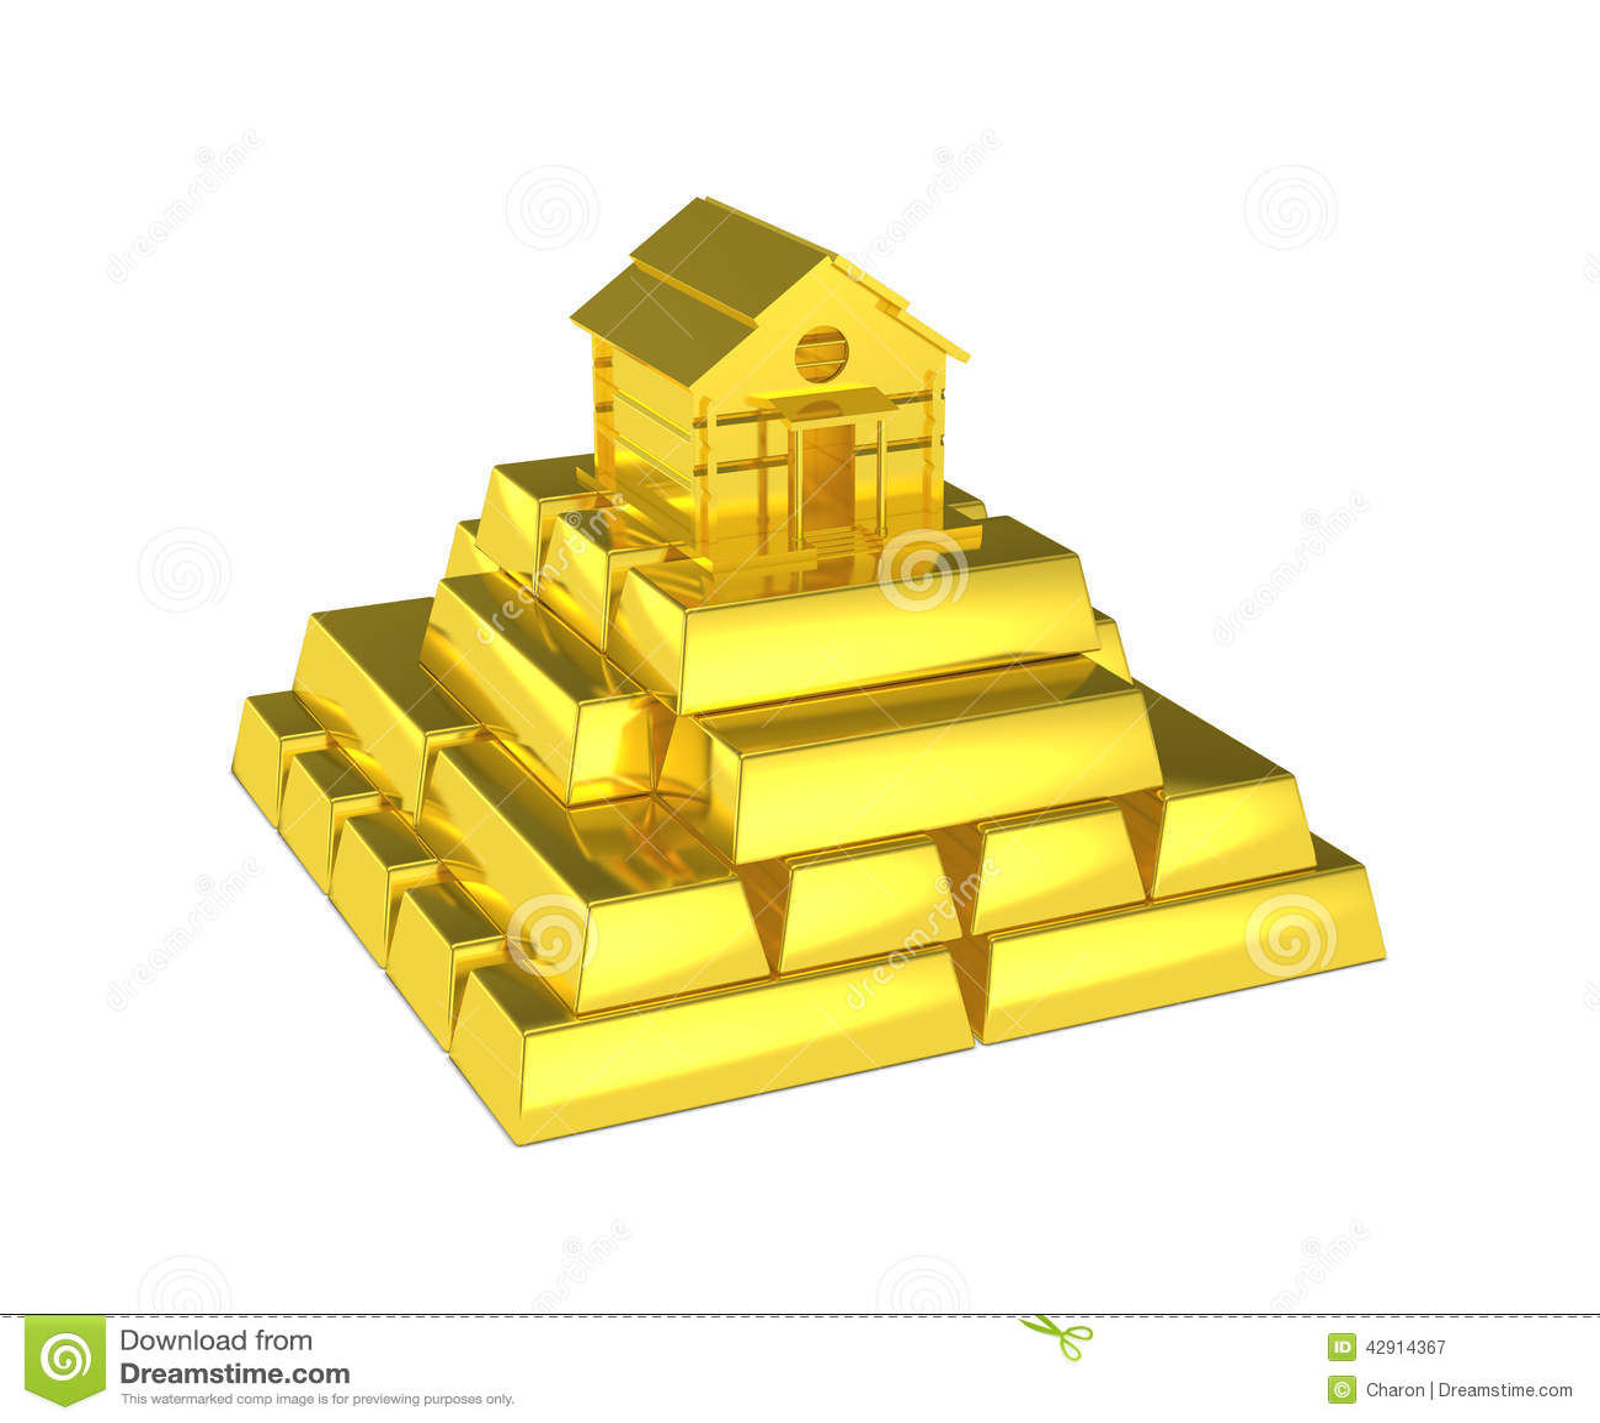 Gold House Stock Illustrations U2013 8,933 Gold House Stock Illustrations,  Vectors U0026 Clipart   Dreamstime